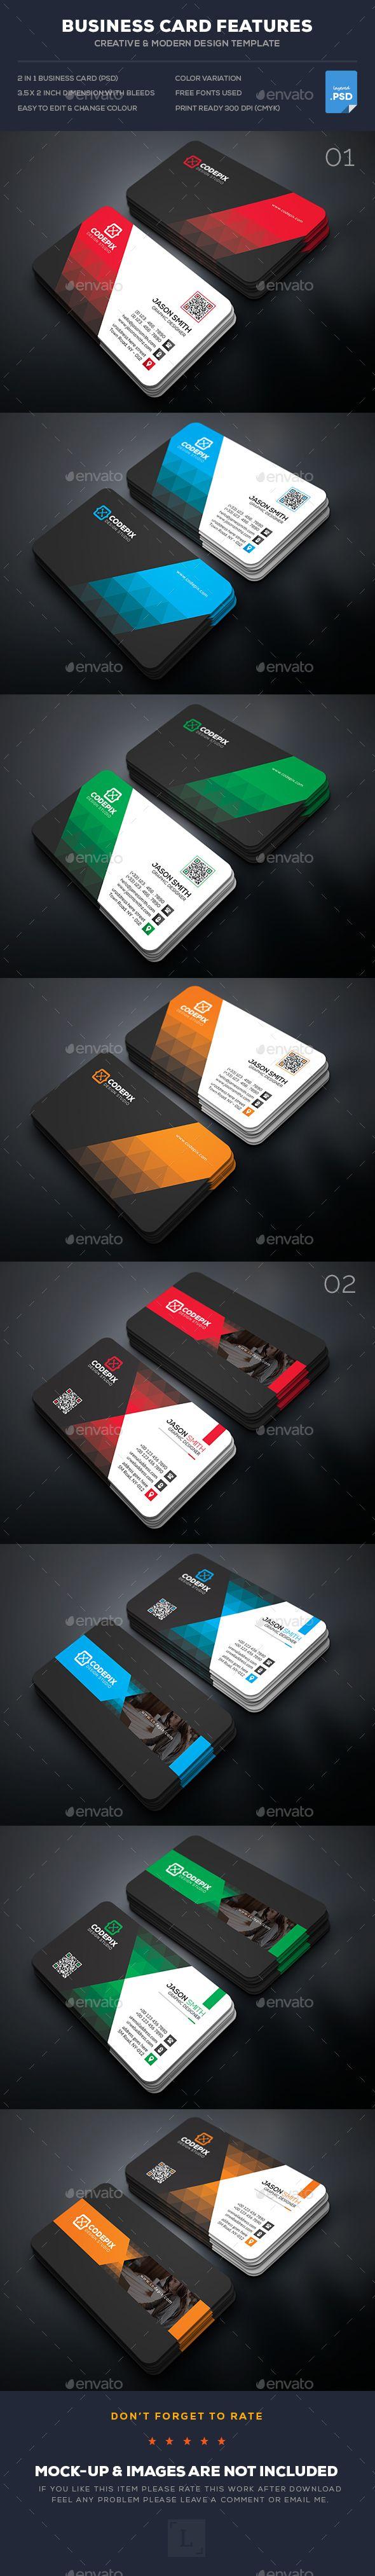 Business Card Bundle - Business Cards Print Templates Download here : https://graphicriver.net/item/business-card-bundle/17655623?s_rank=39&ref=Al-fatih